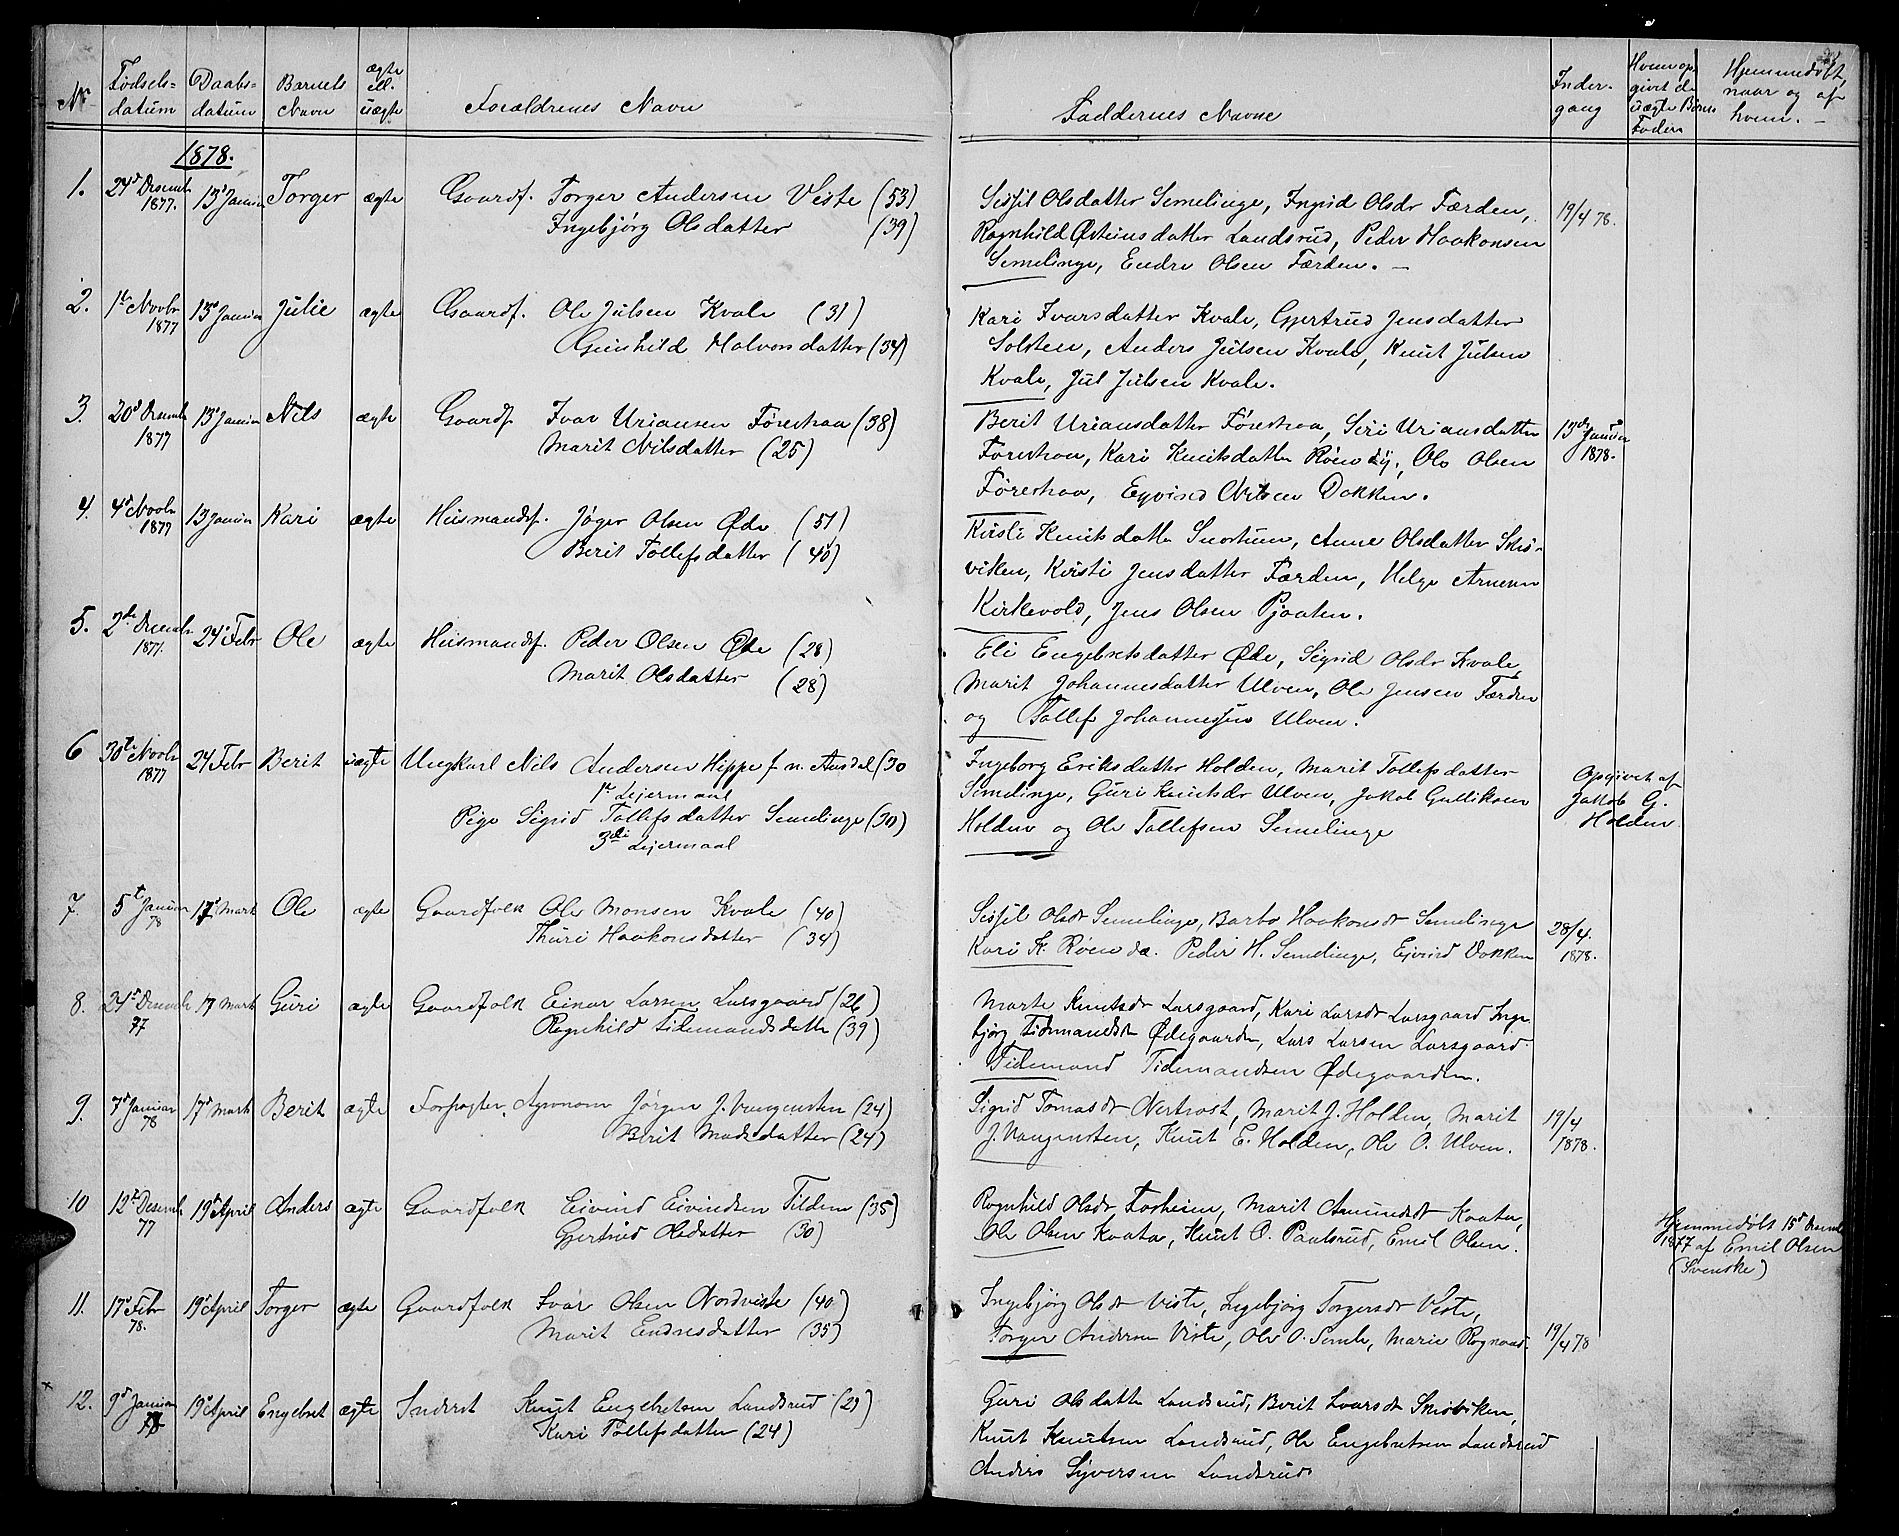 SAH, Vestre Slidre prestekontor, Klokkerbok nr. 3, 1869-1882, s. 21